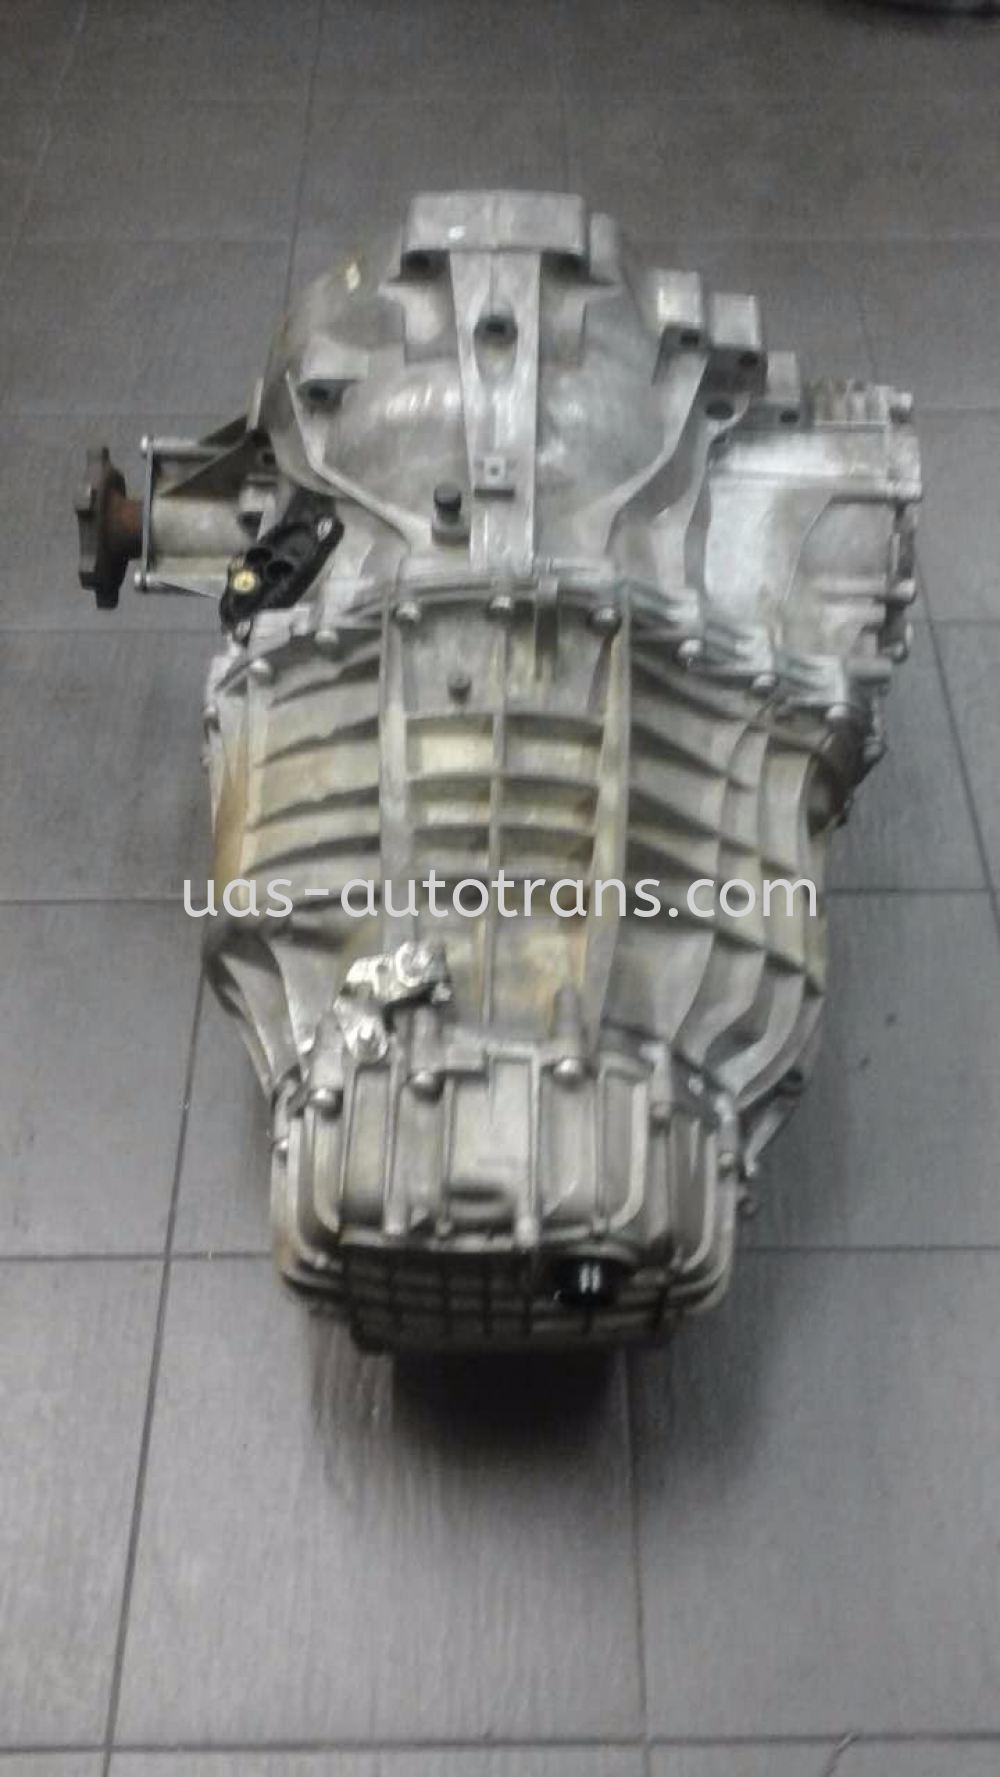 Specialist in auto transmission & torque converter